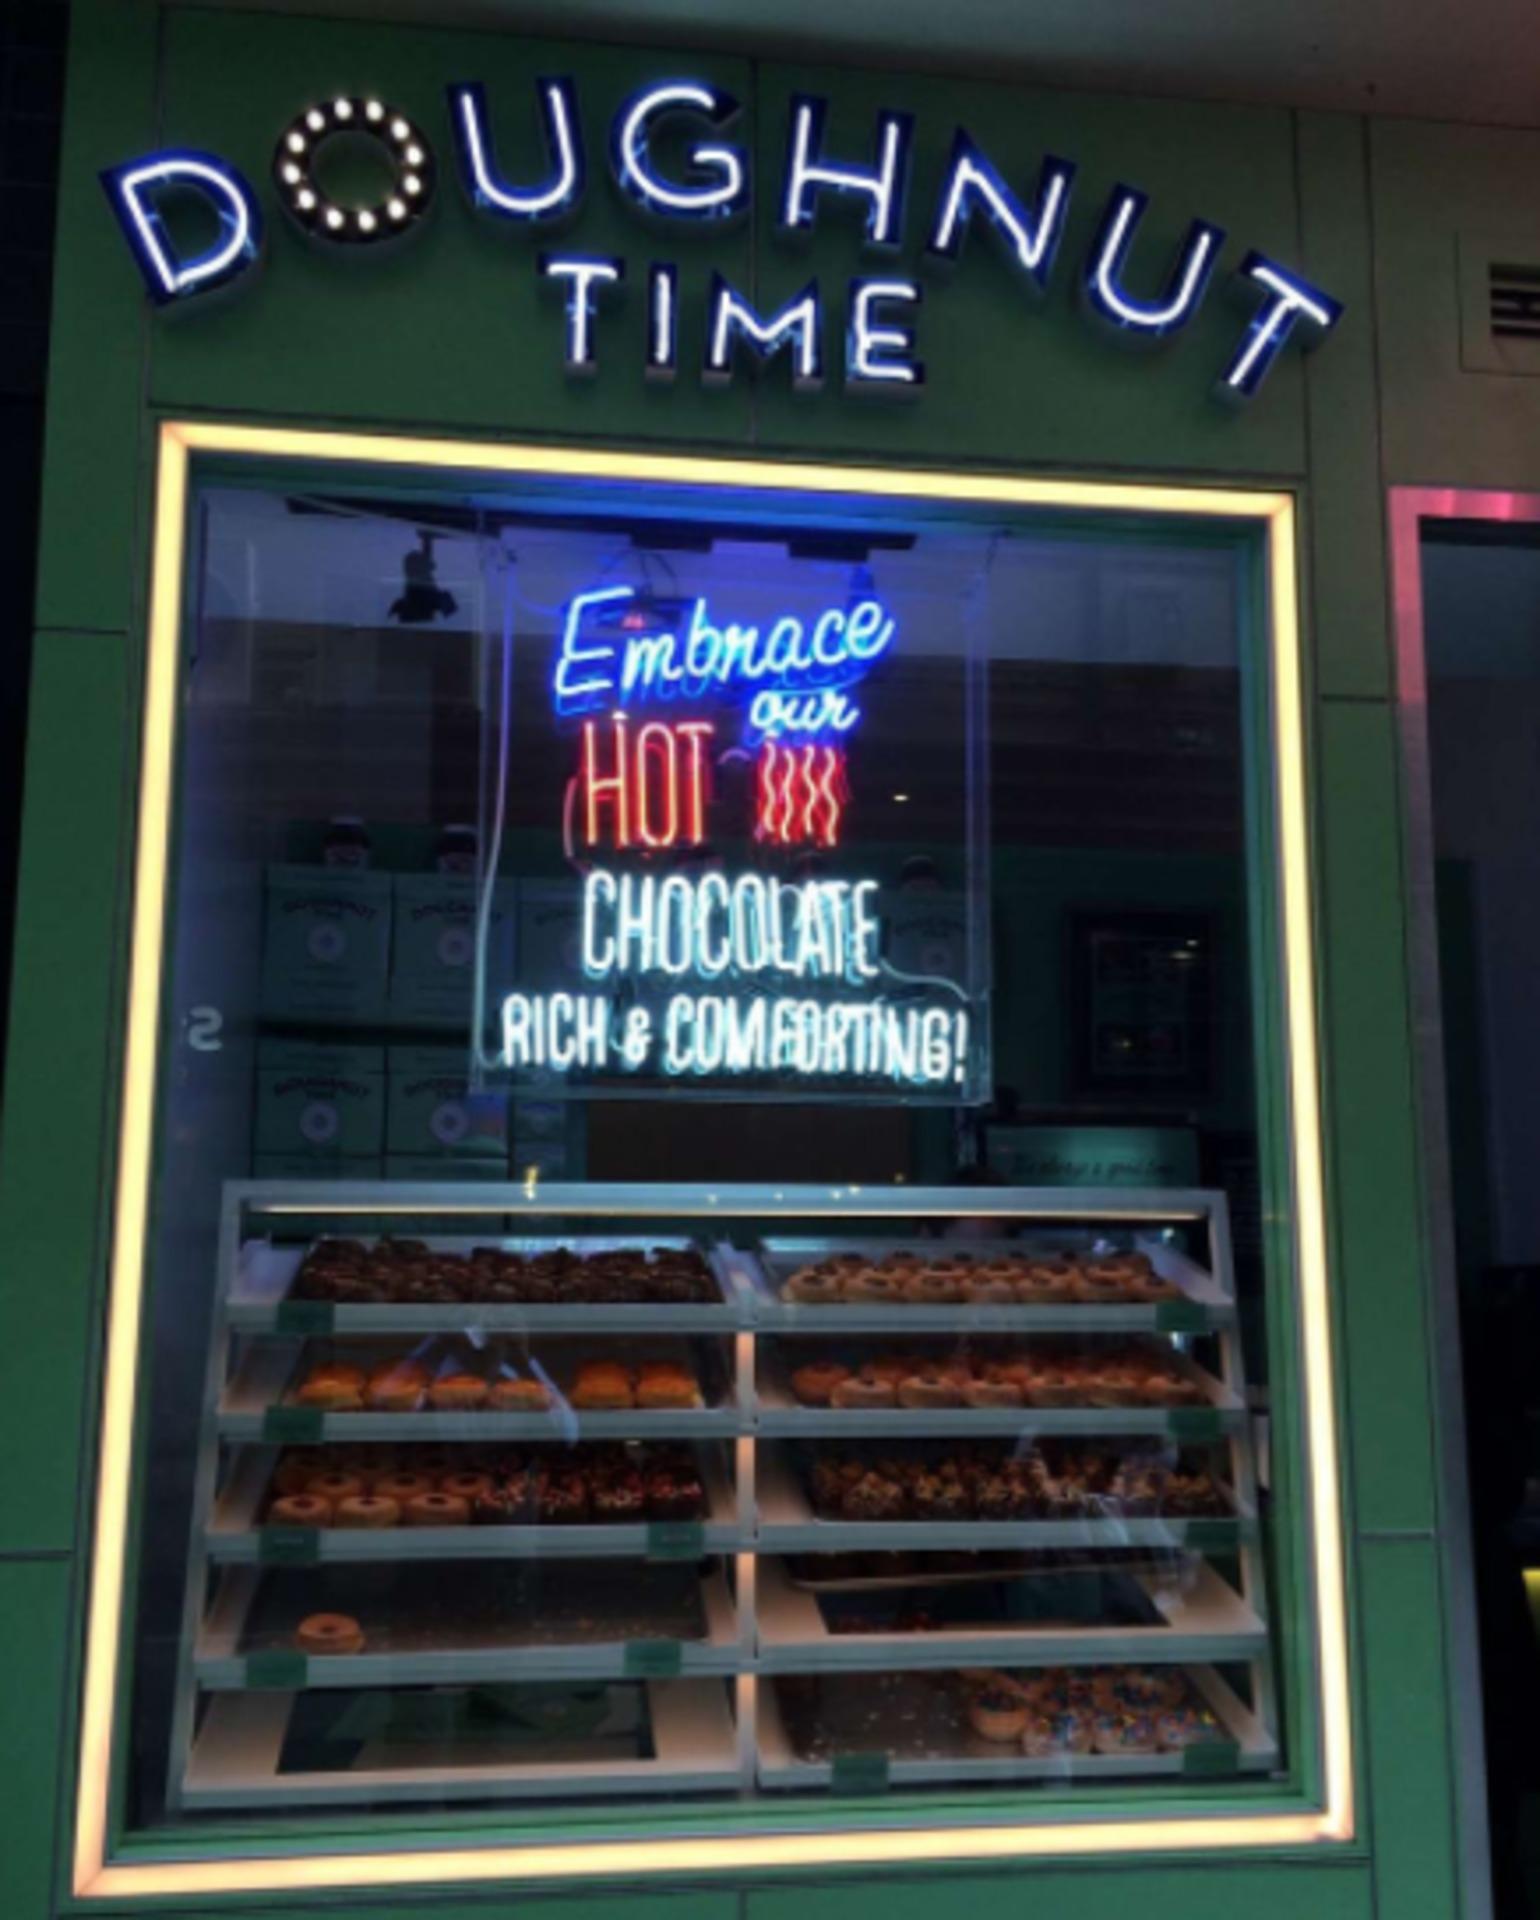 Doughnut Time image